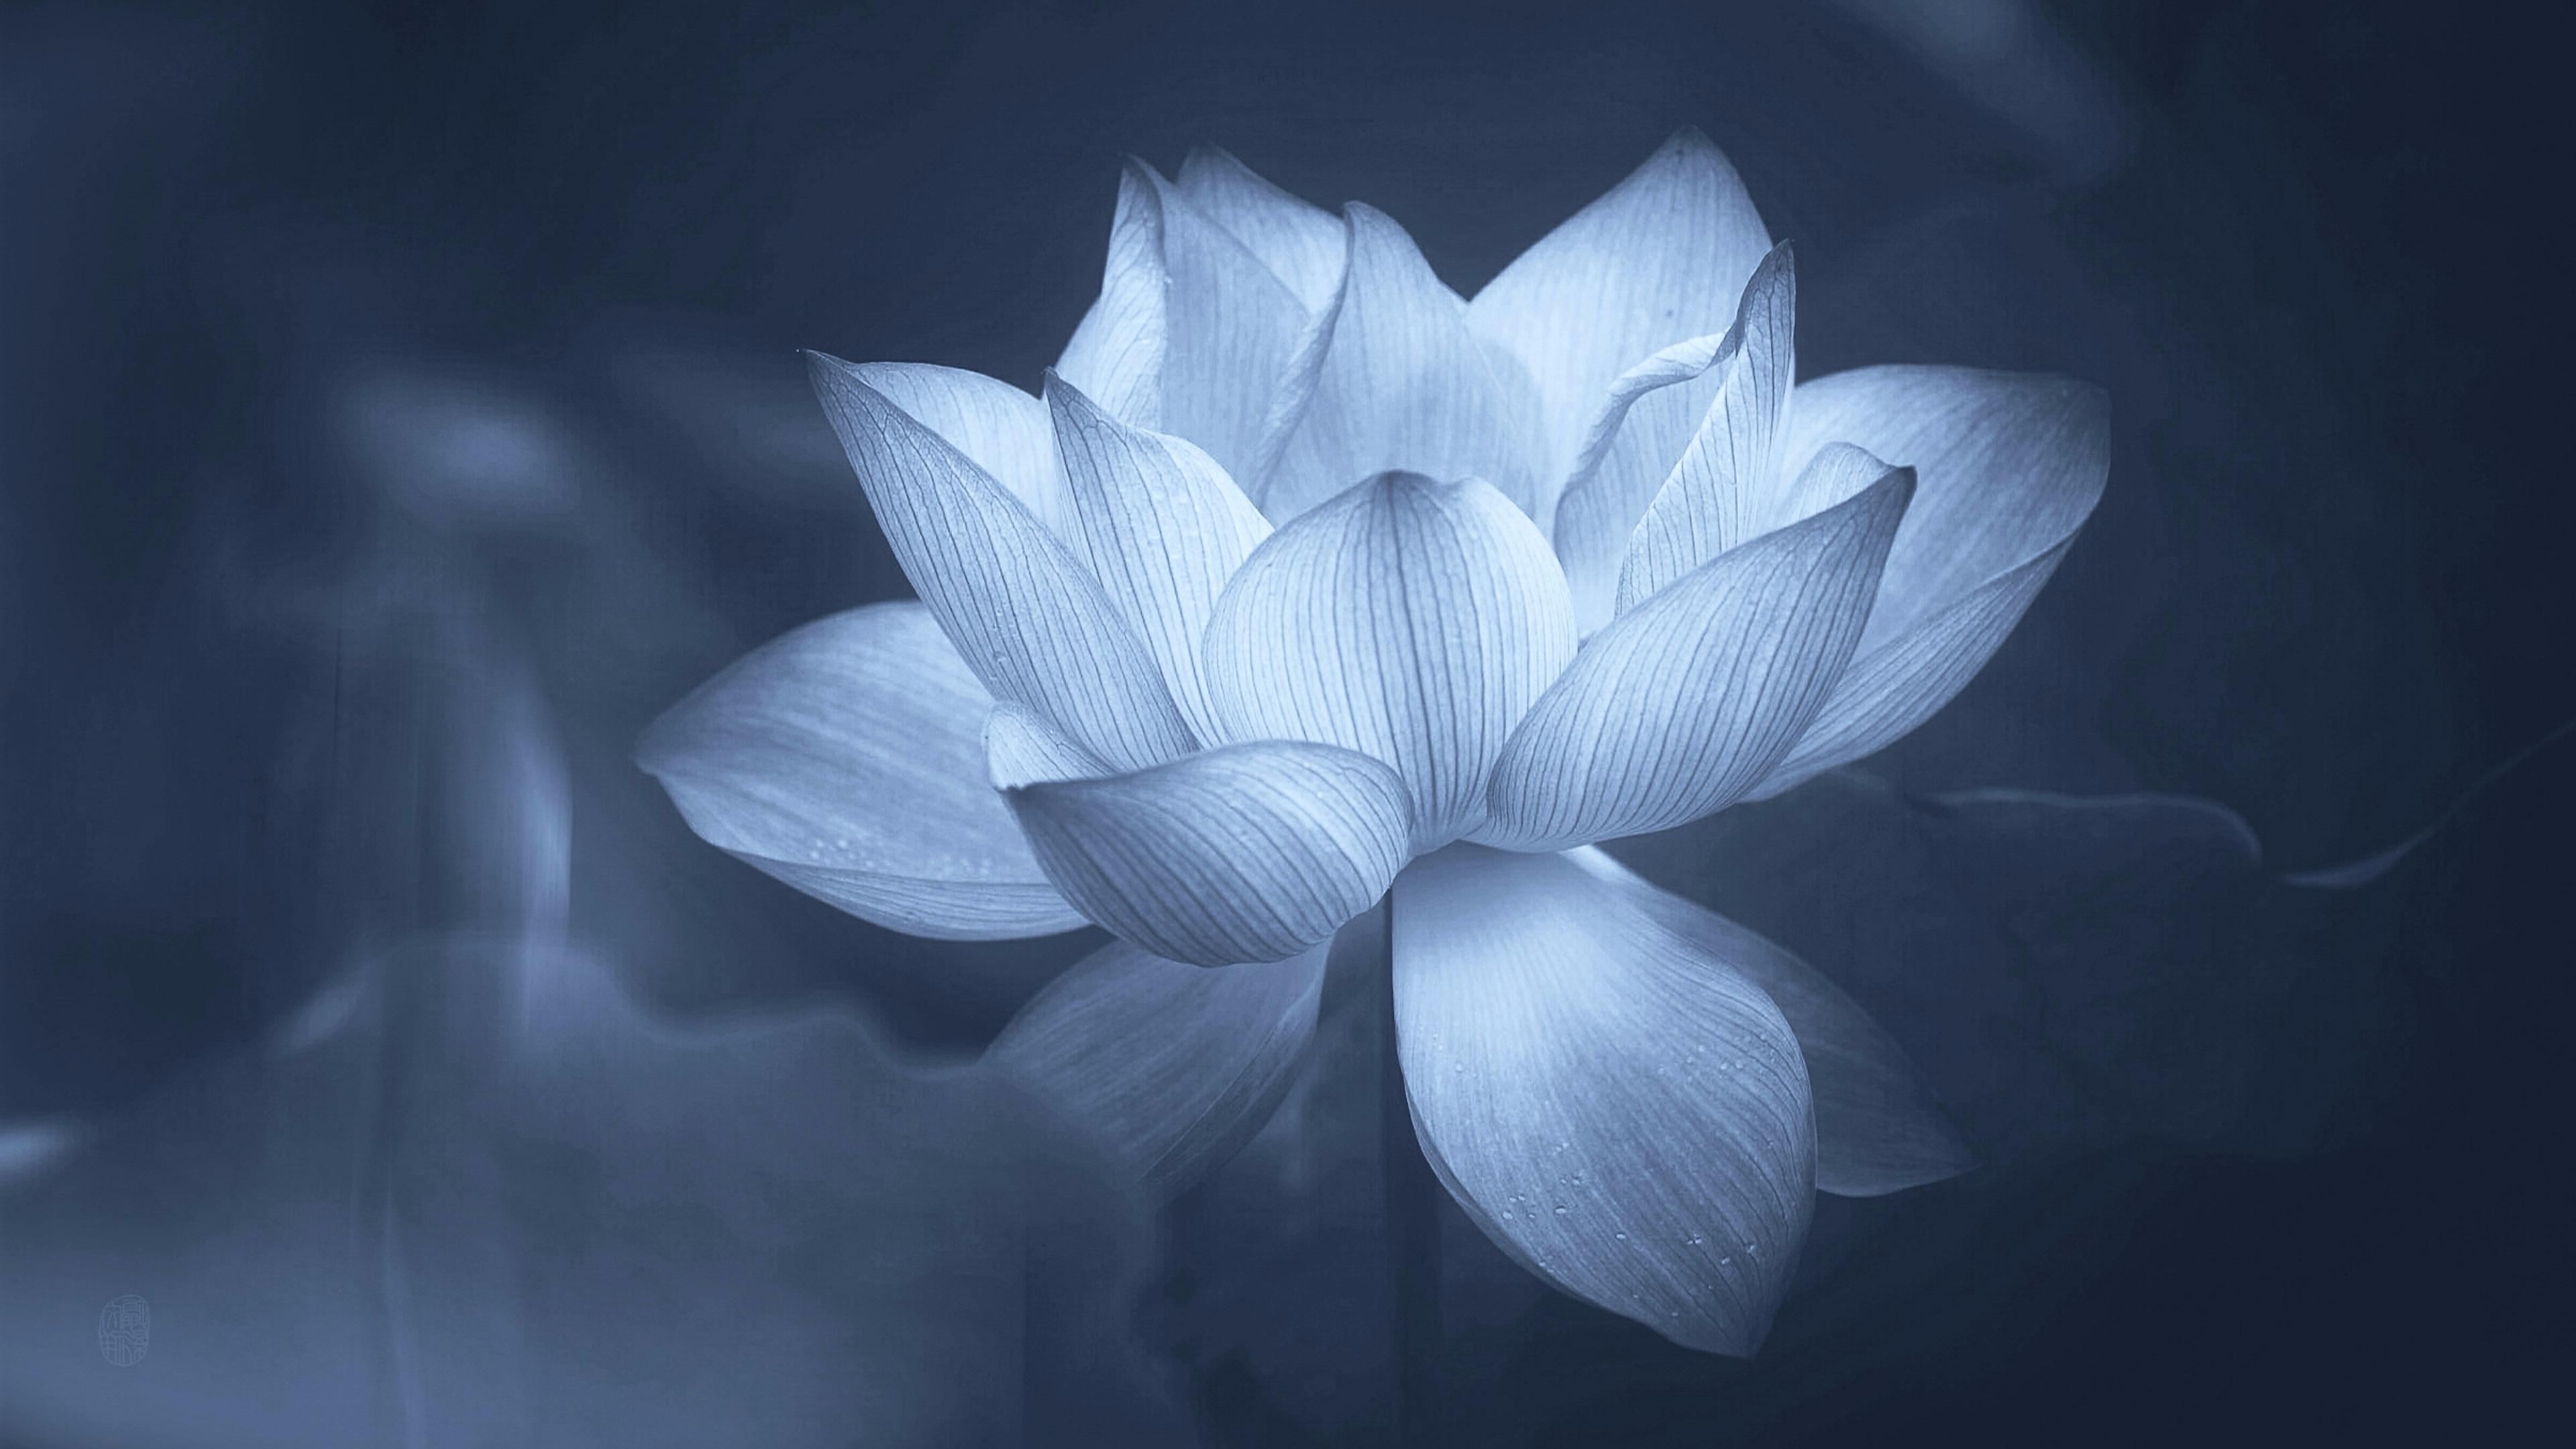 Get Here Lotus Flower Black And White Wallpaper - 3d wallpaper